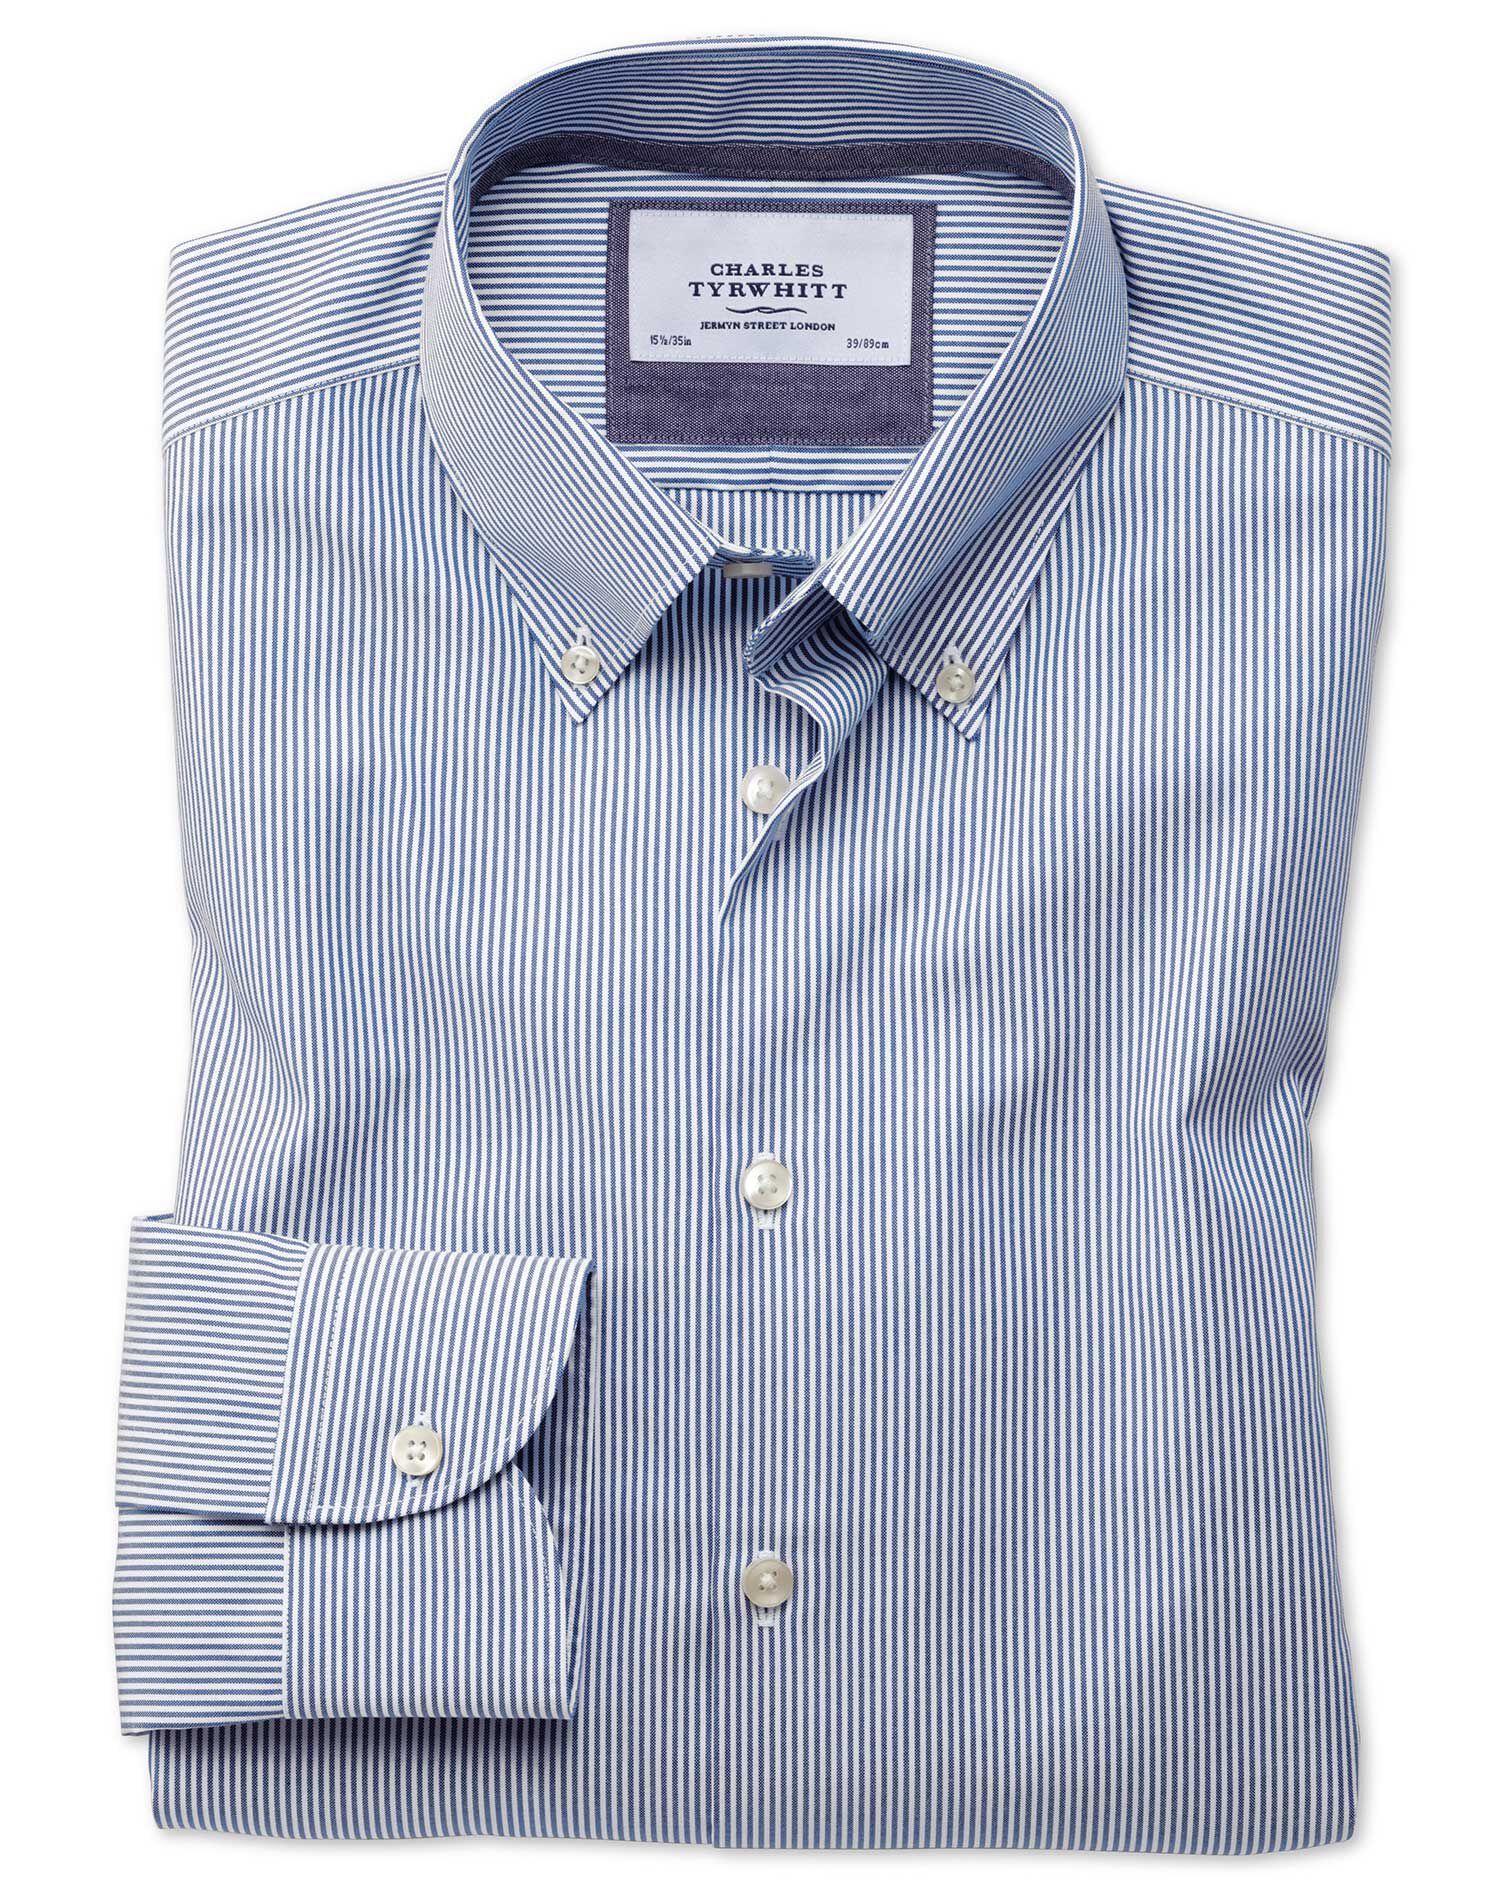 Slim Fit Button-Down Business Casual Non-Iron Blue Stripe Cotton Formal Shirt Single Cuff Size 16.5/